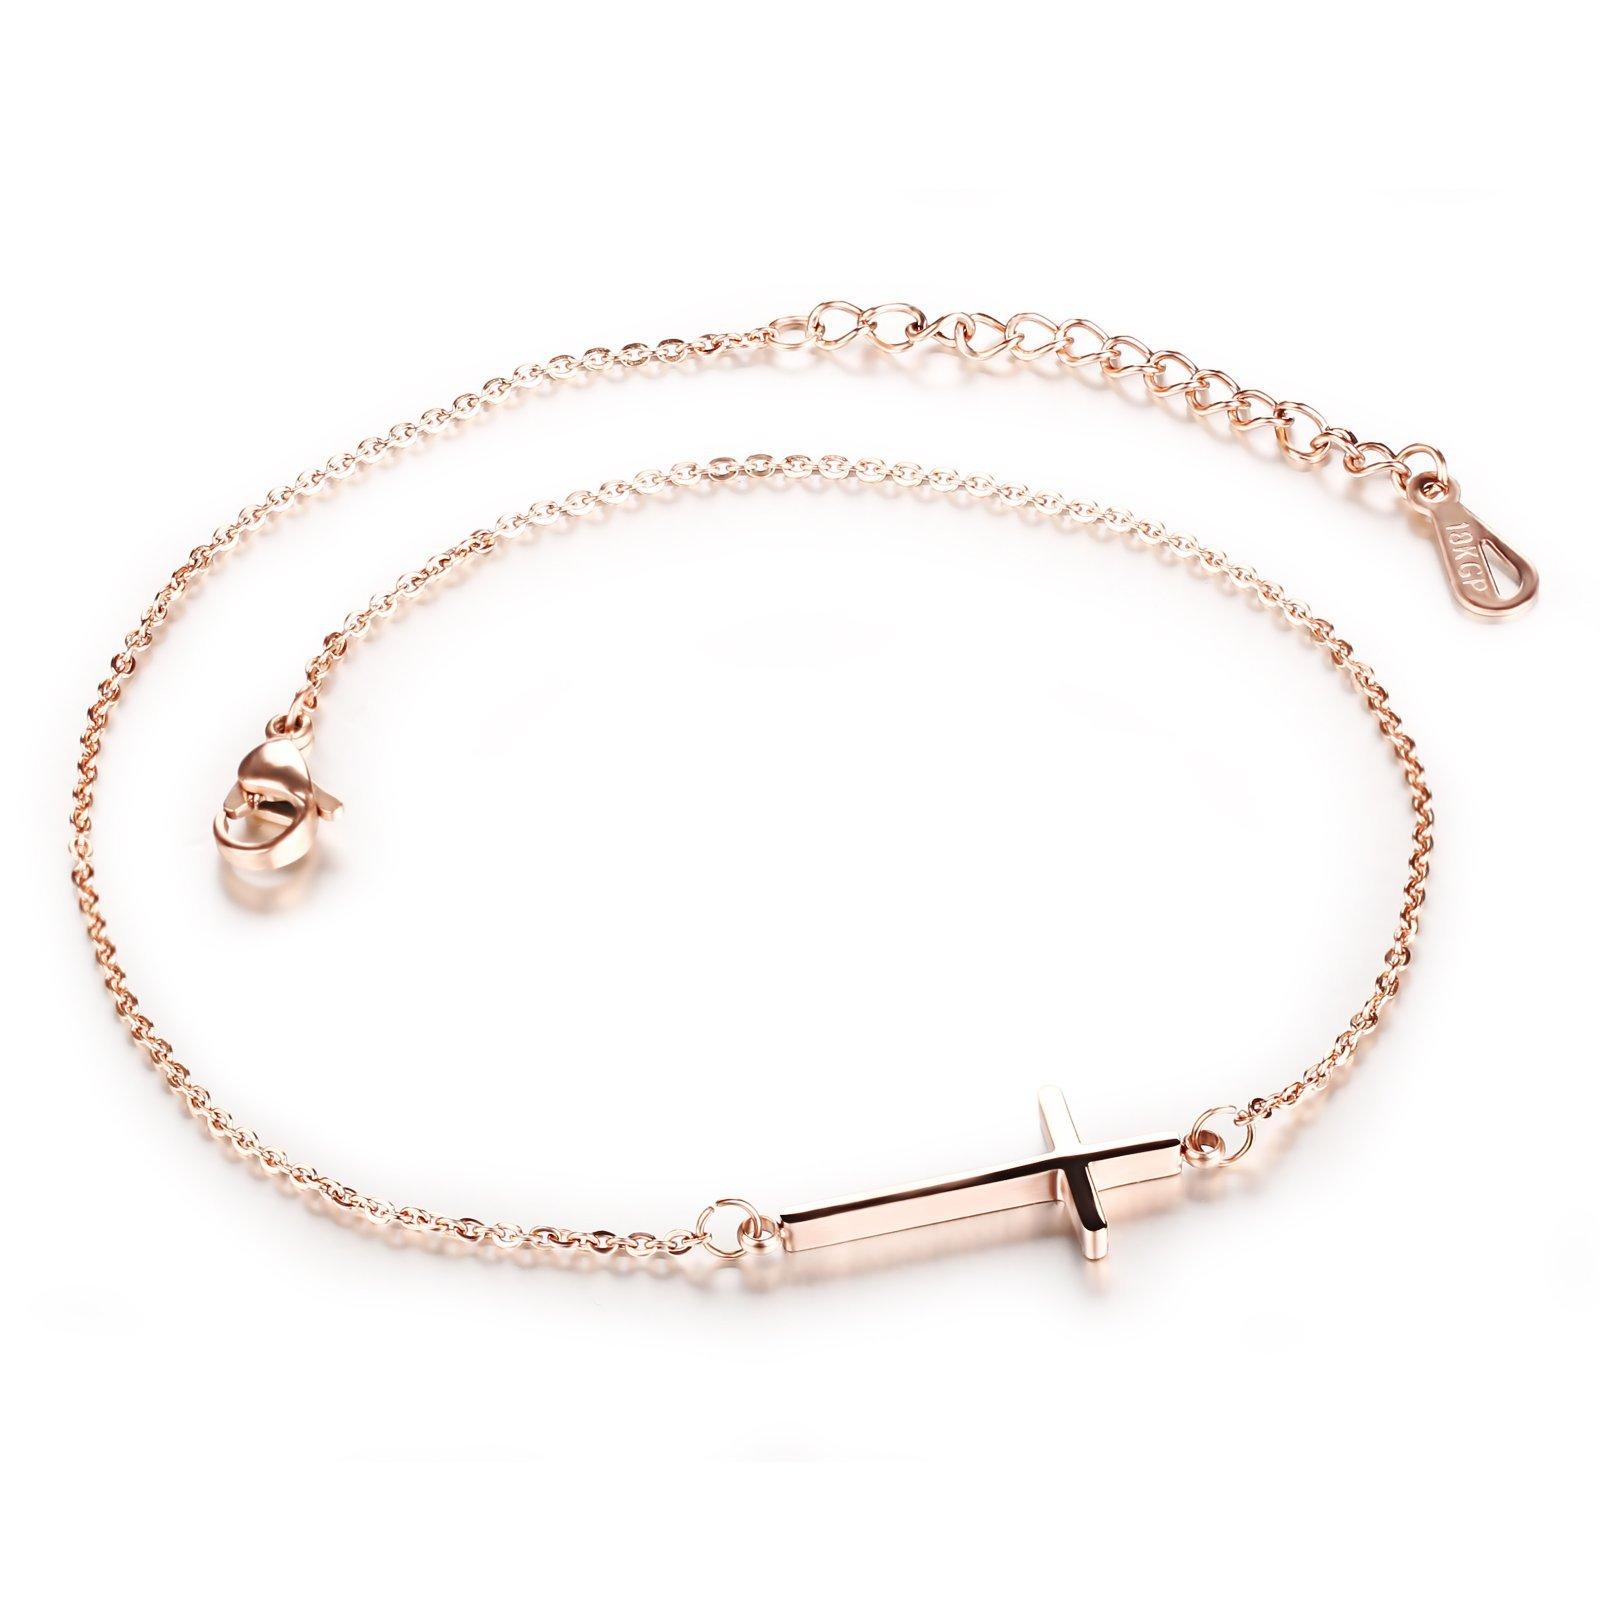 MONIYA Classic Stainless Steel Sideways Cross Anklet Bracelet Women Beach Foot Jewelry, Length Adjustable